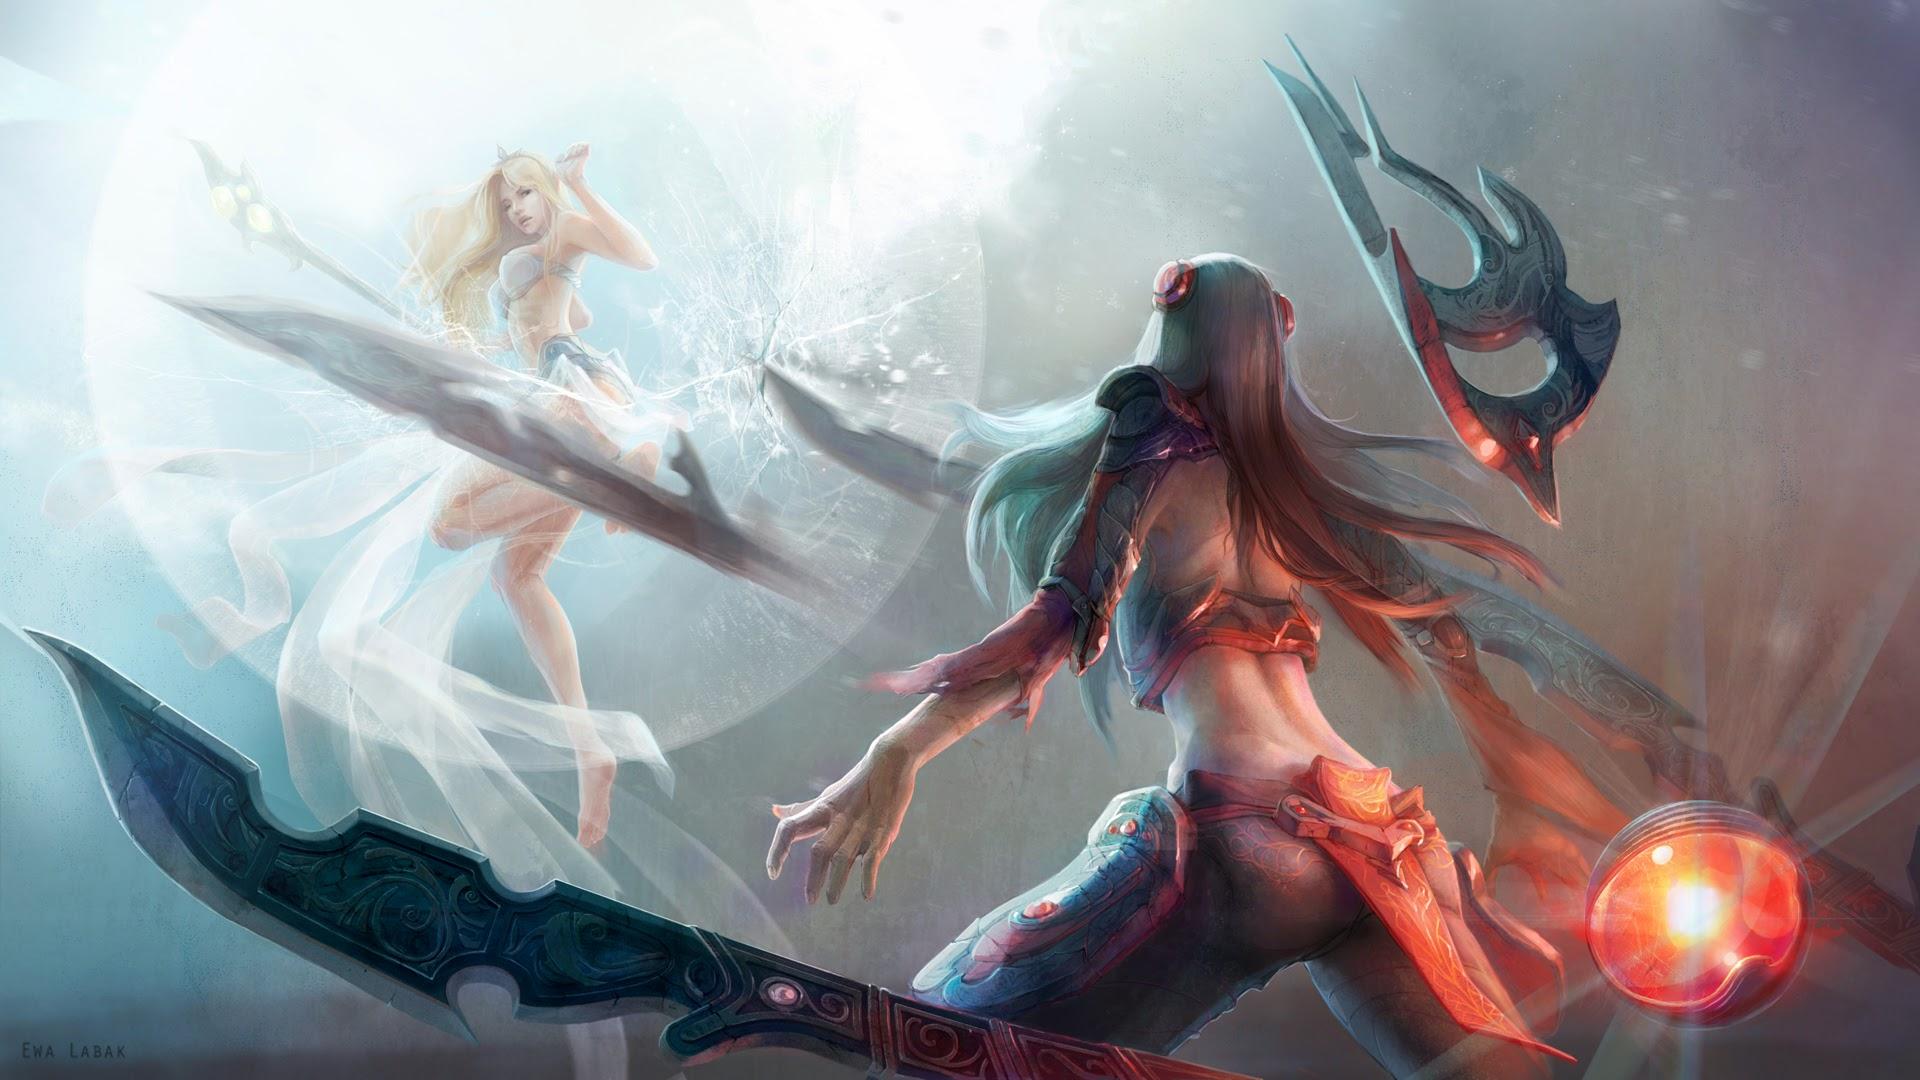 irelia vs janna league of legends 3s wallpaper hd